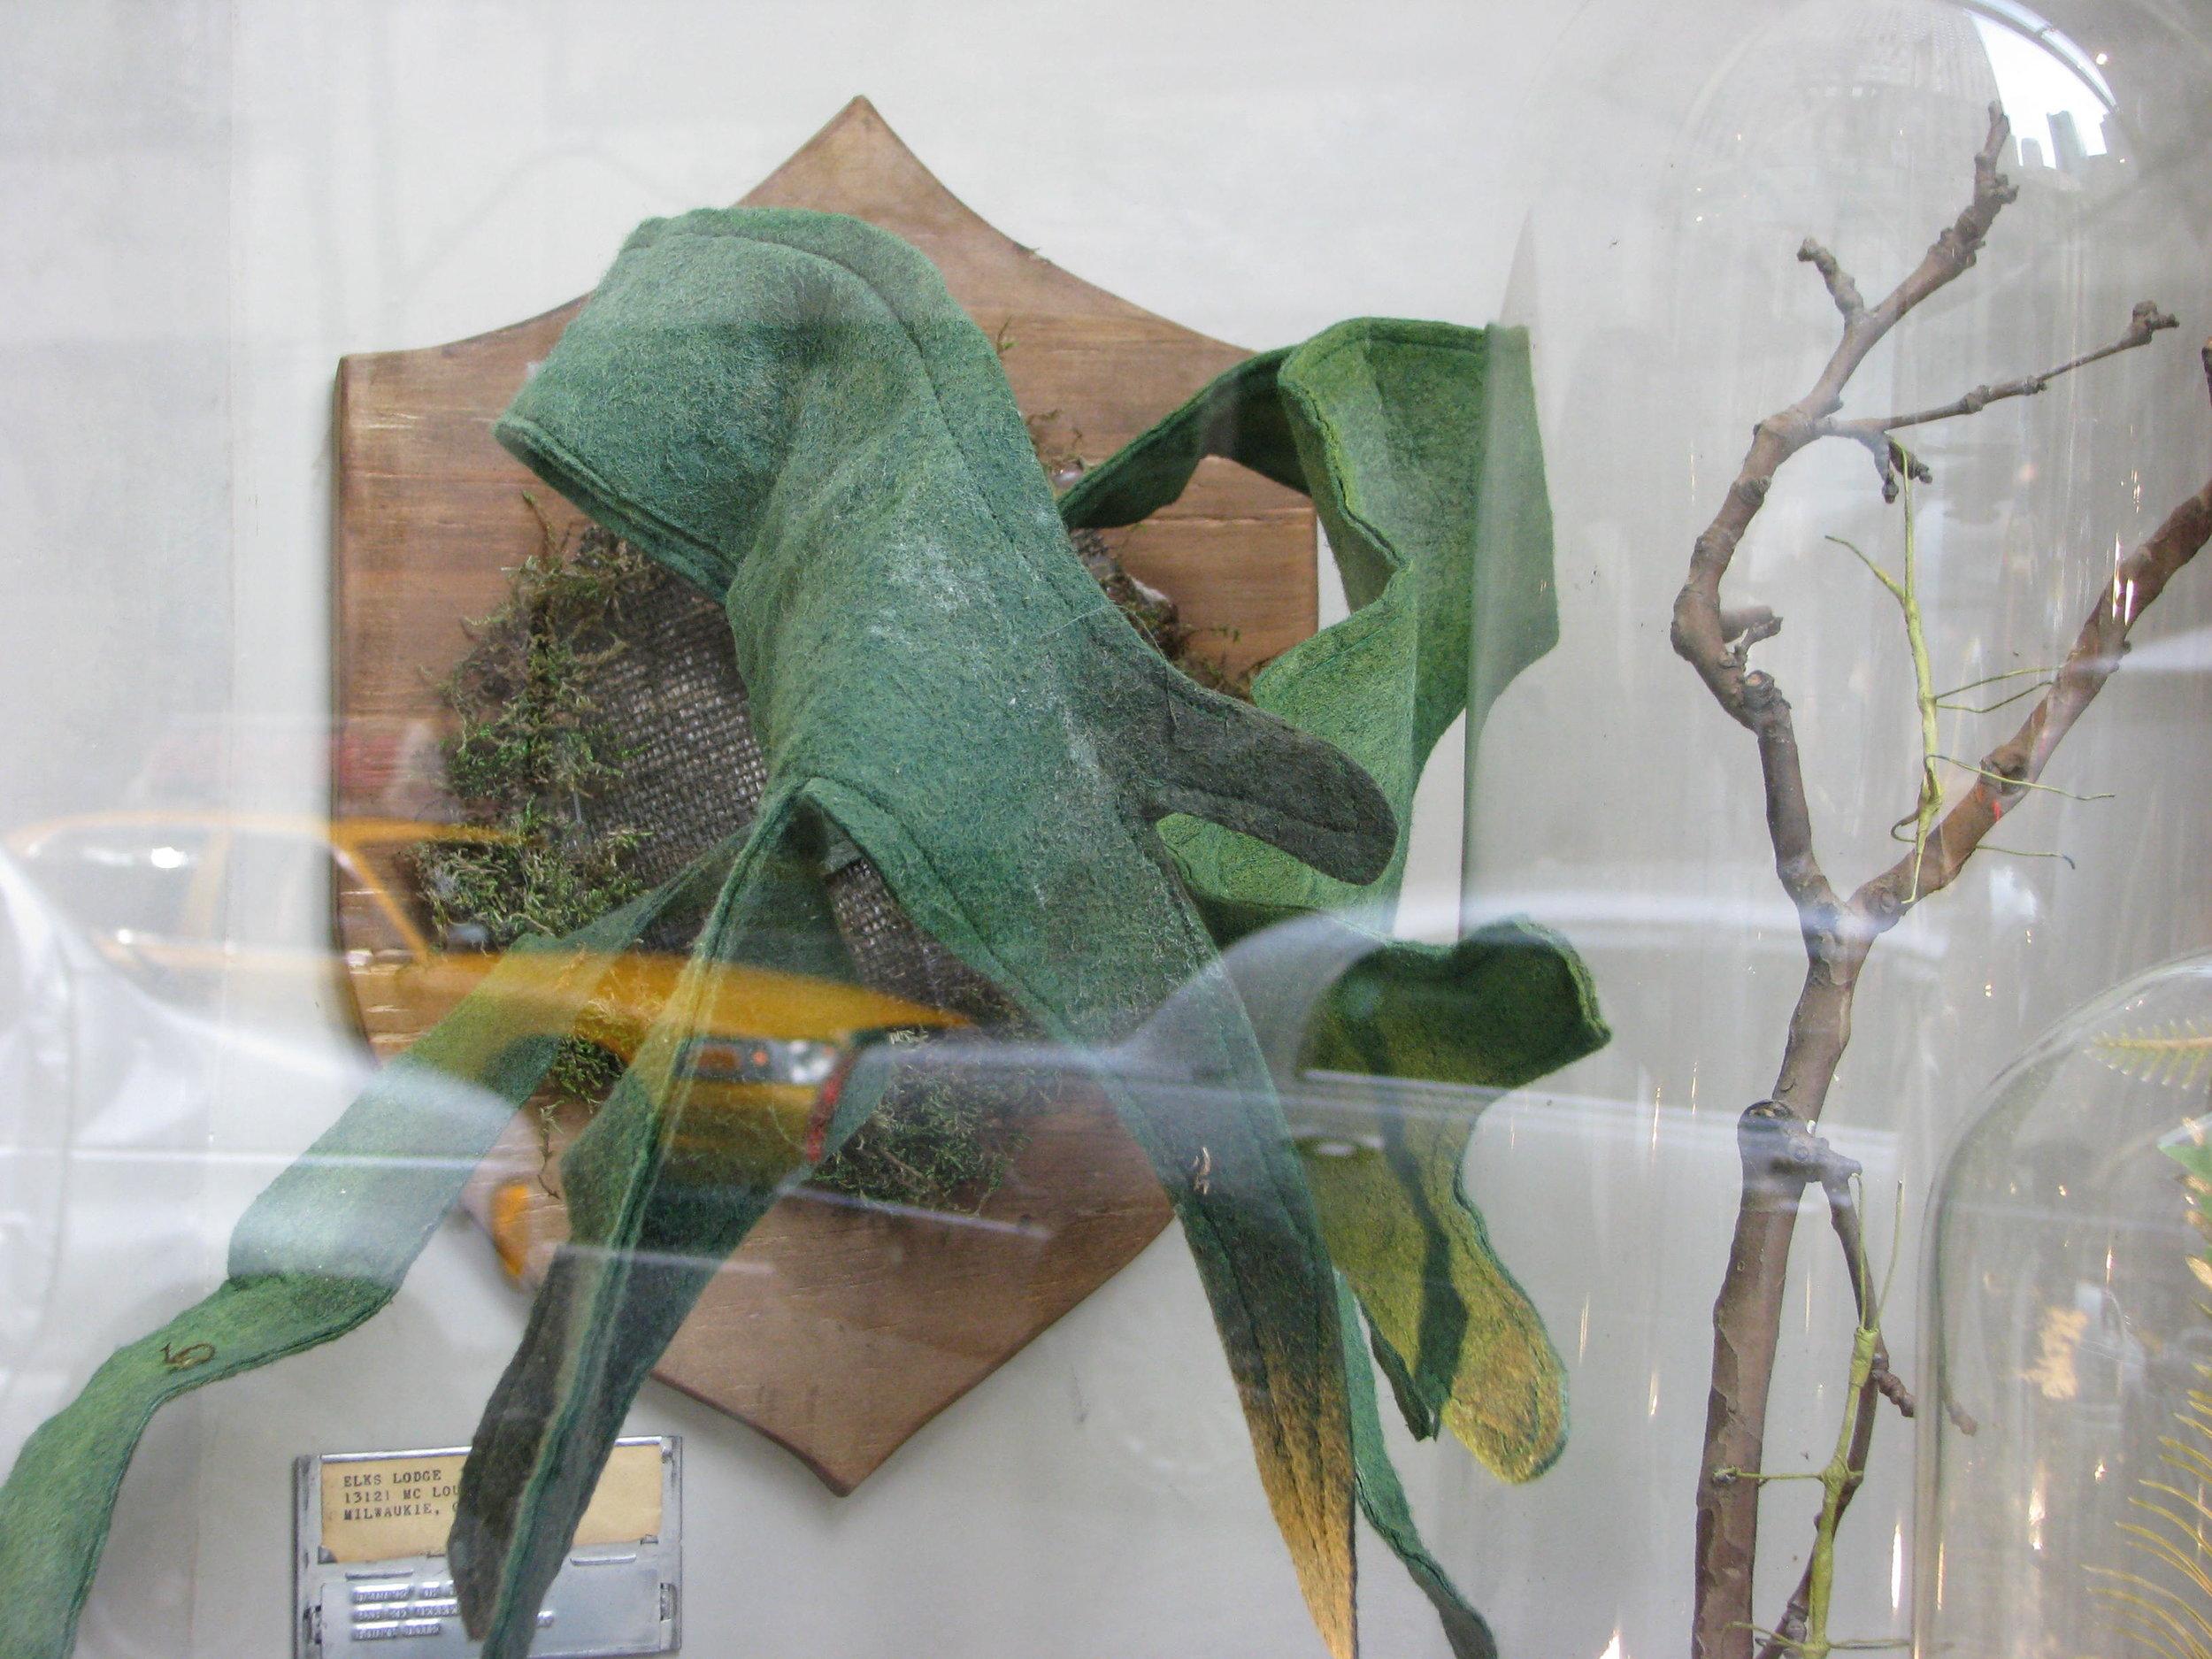 Anthropologie Windows_Dyed Flowers Rock Center_3 029.JPG